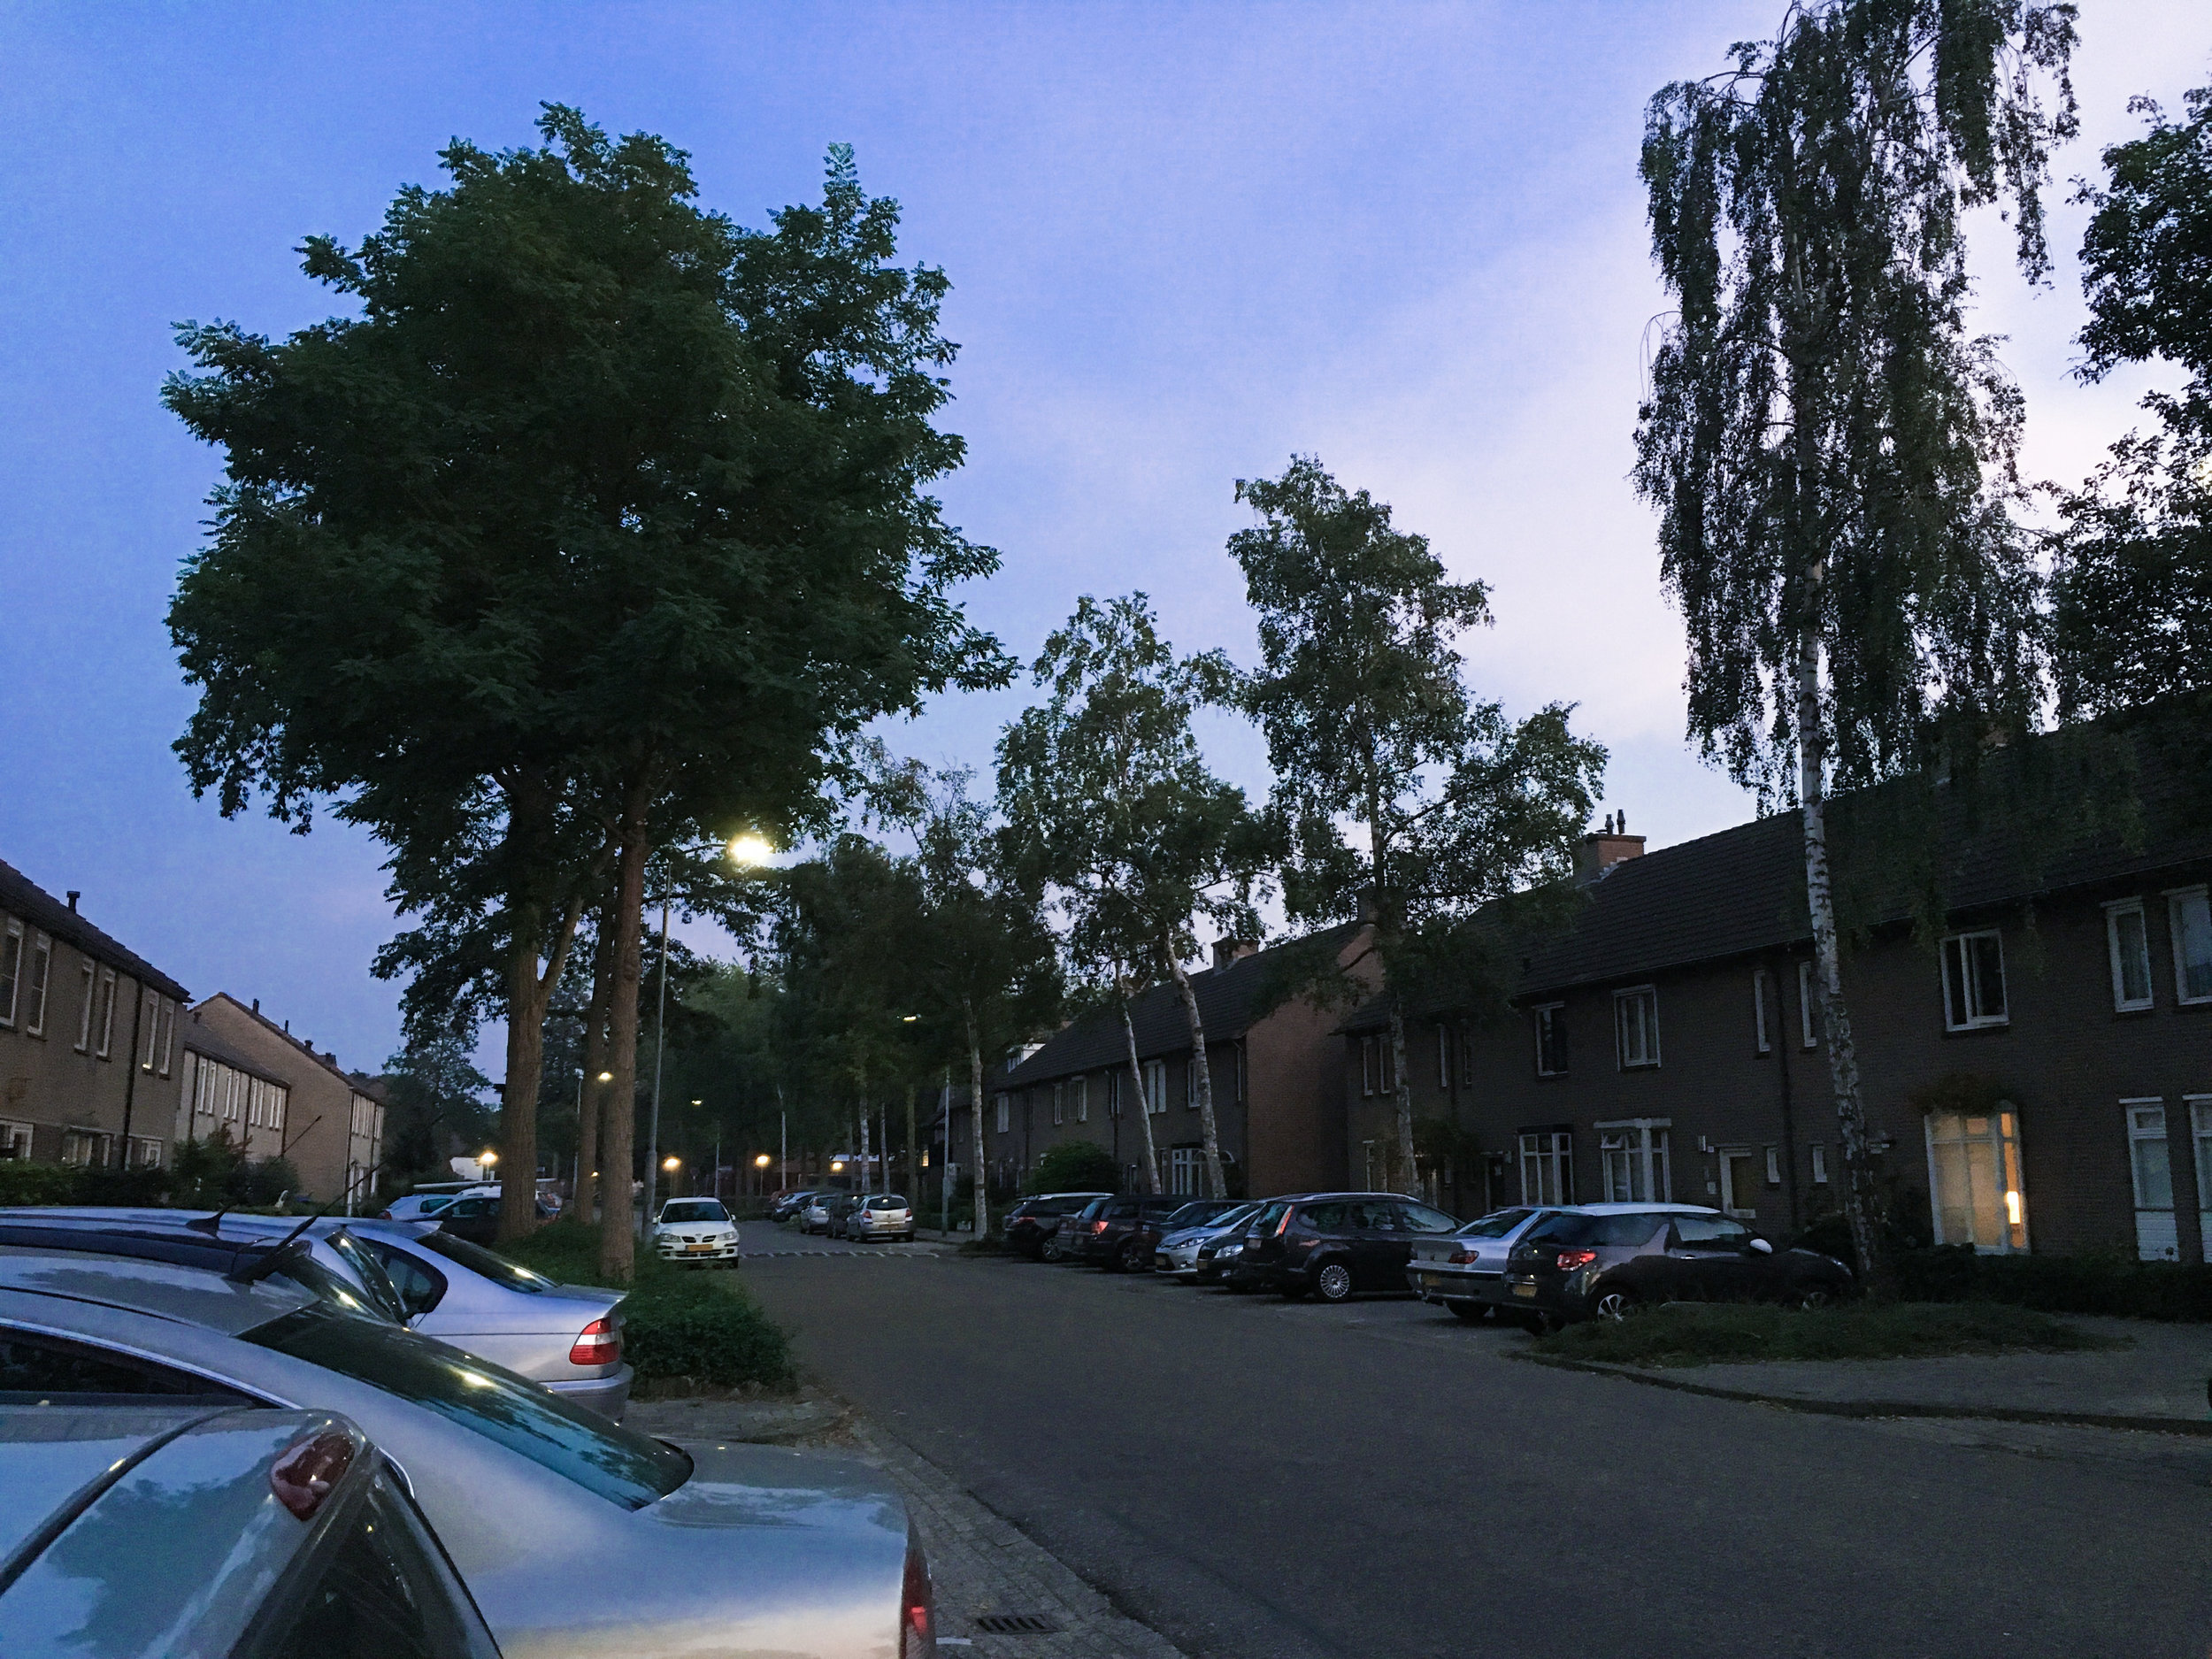 My street!